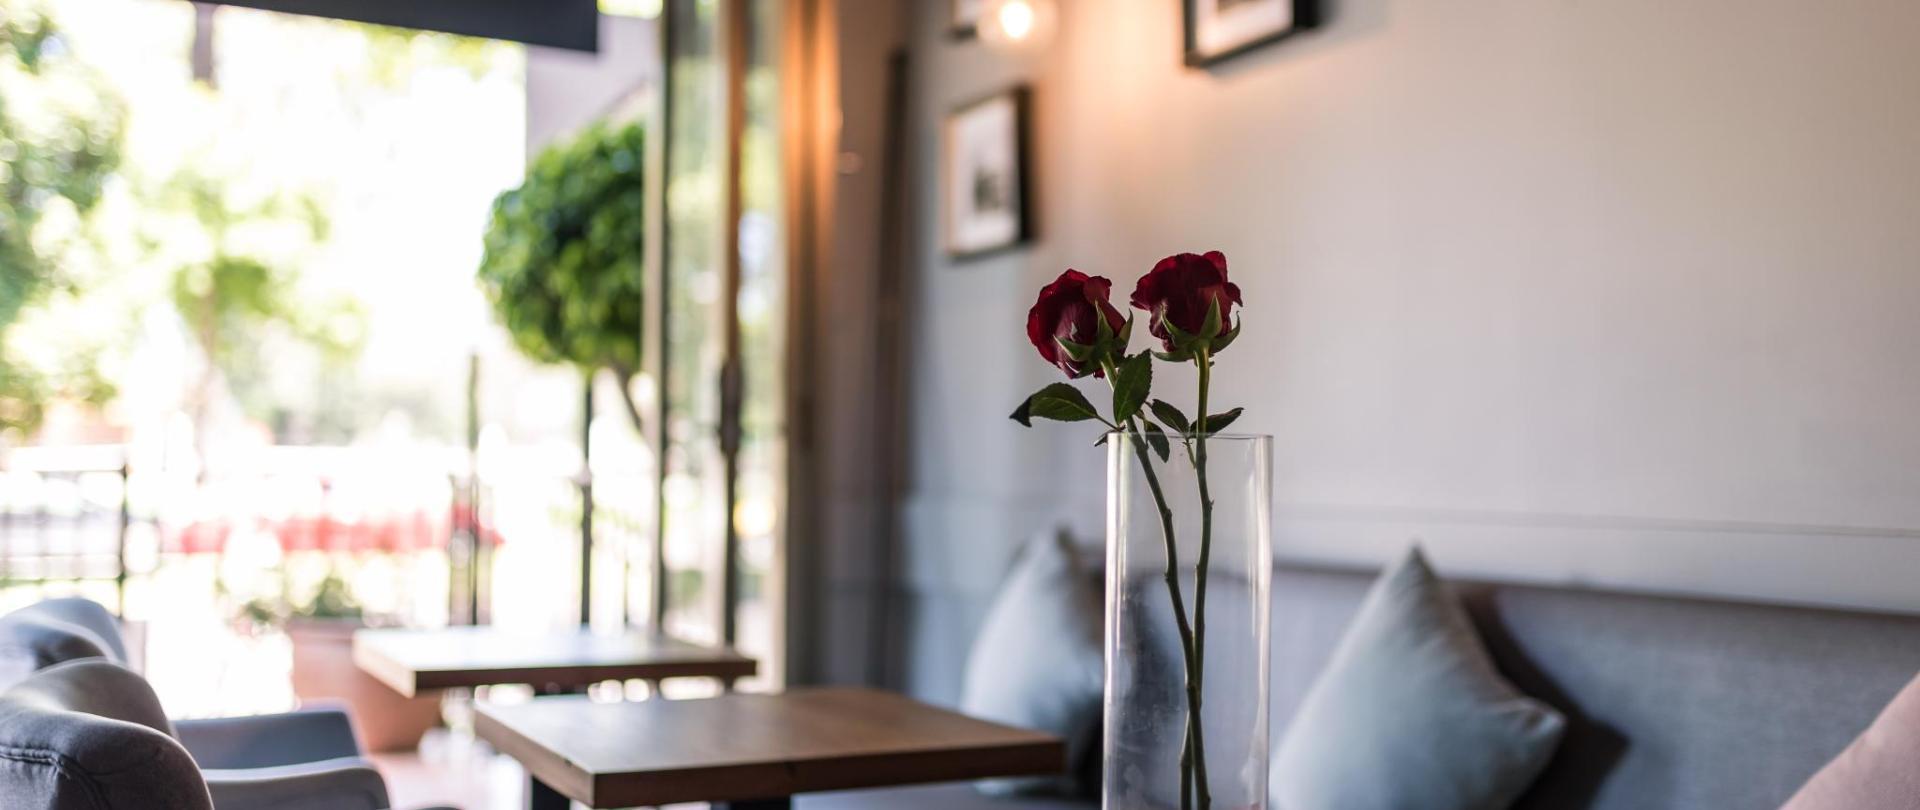 Cafe 3.jpg